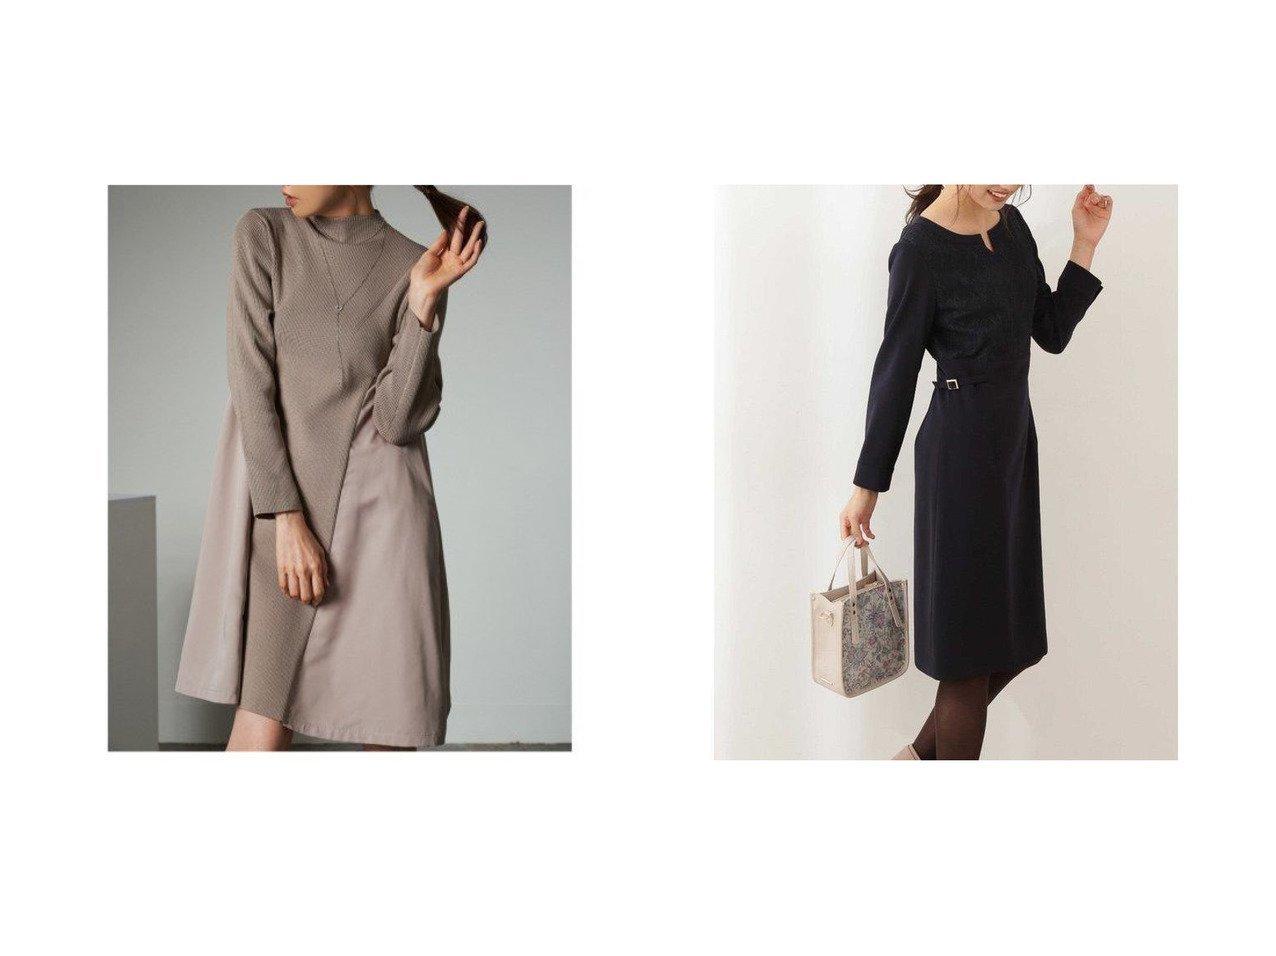 【PROPORTION BODY DRESSING/プロポーション ボディドレッシング】のレースドッキングワンピース&【CELFORD/セルフォード】のドッキングAラインニットワンピース ワンピース・ドレスのおすすめ!人気、レディースファッションの通販  おすすめで人気のファッション通販商品 インテリア・家具・キッズファッション・メンズファッション・レディースファッション・服の通販 founy(ファニー) https://founy.com/ ファッション Fashion レディース WOMEN ワンピース Dress ニットワンピース Knit Dresses グログラン スマート ドッキング フォルム 冬 Winter オケージョン シンプル レース |ID:crp329100000004281